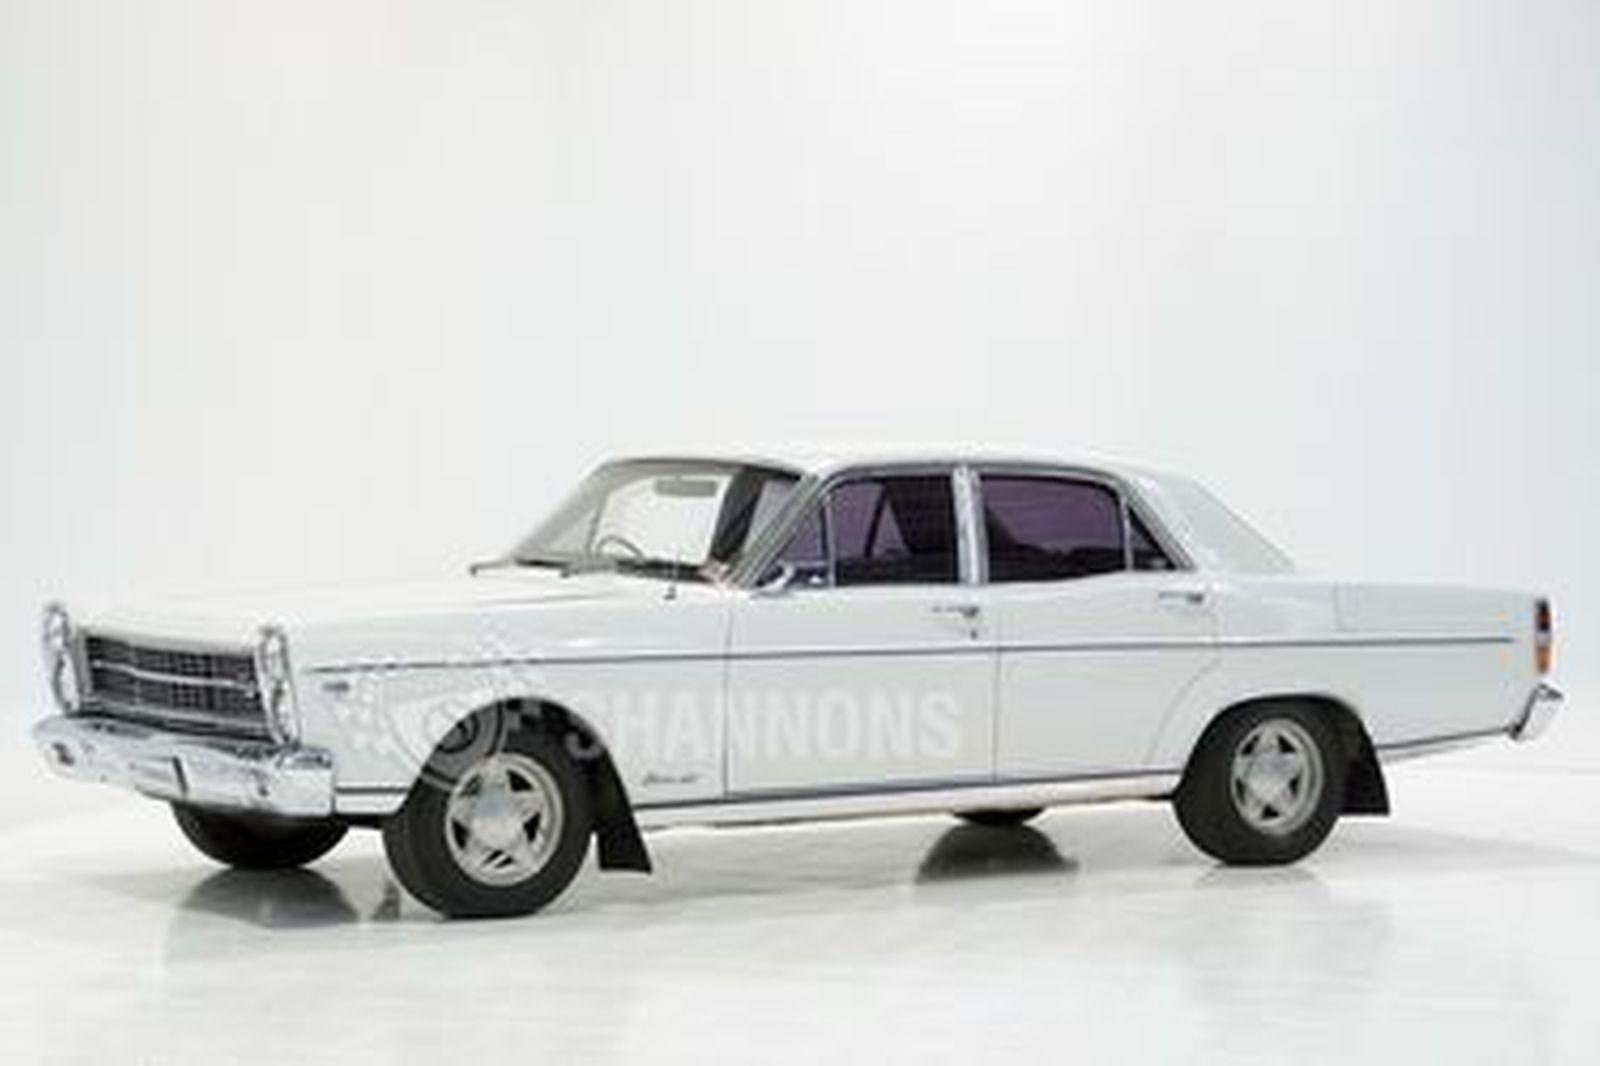 Ford ZD Fairlane V8 Sedan